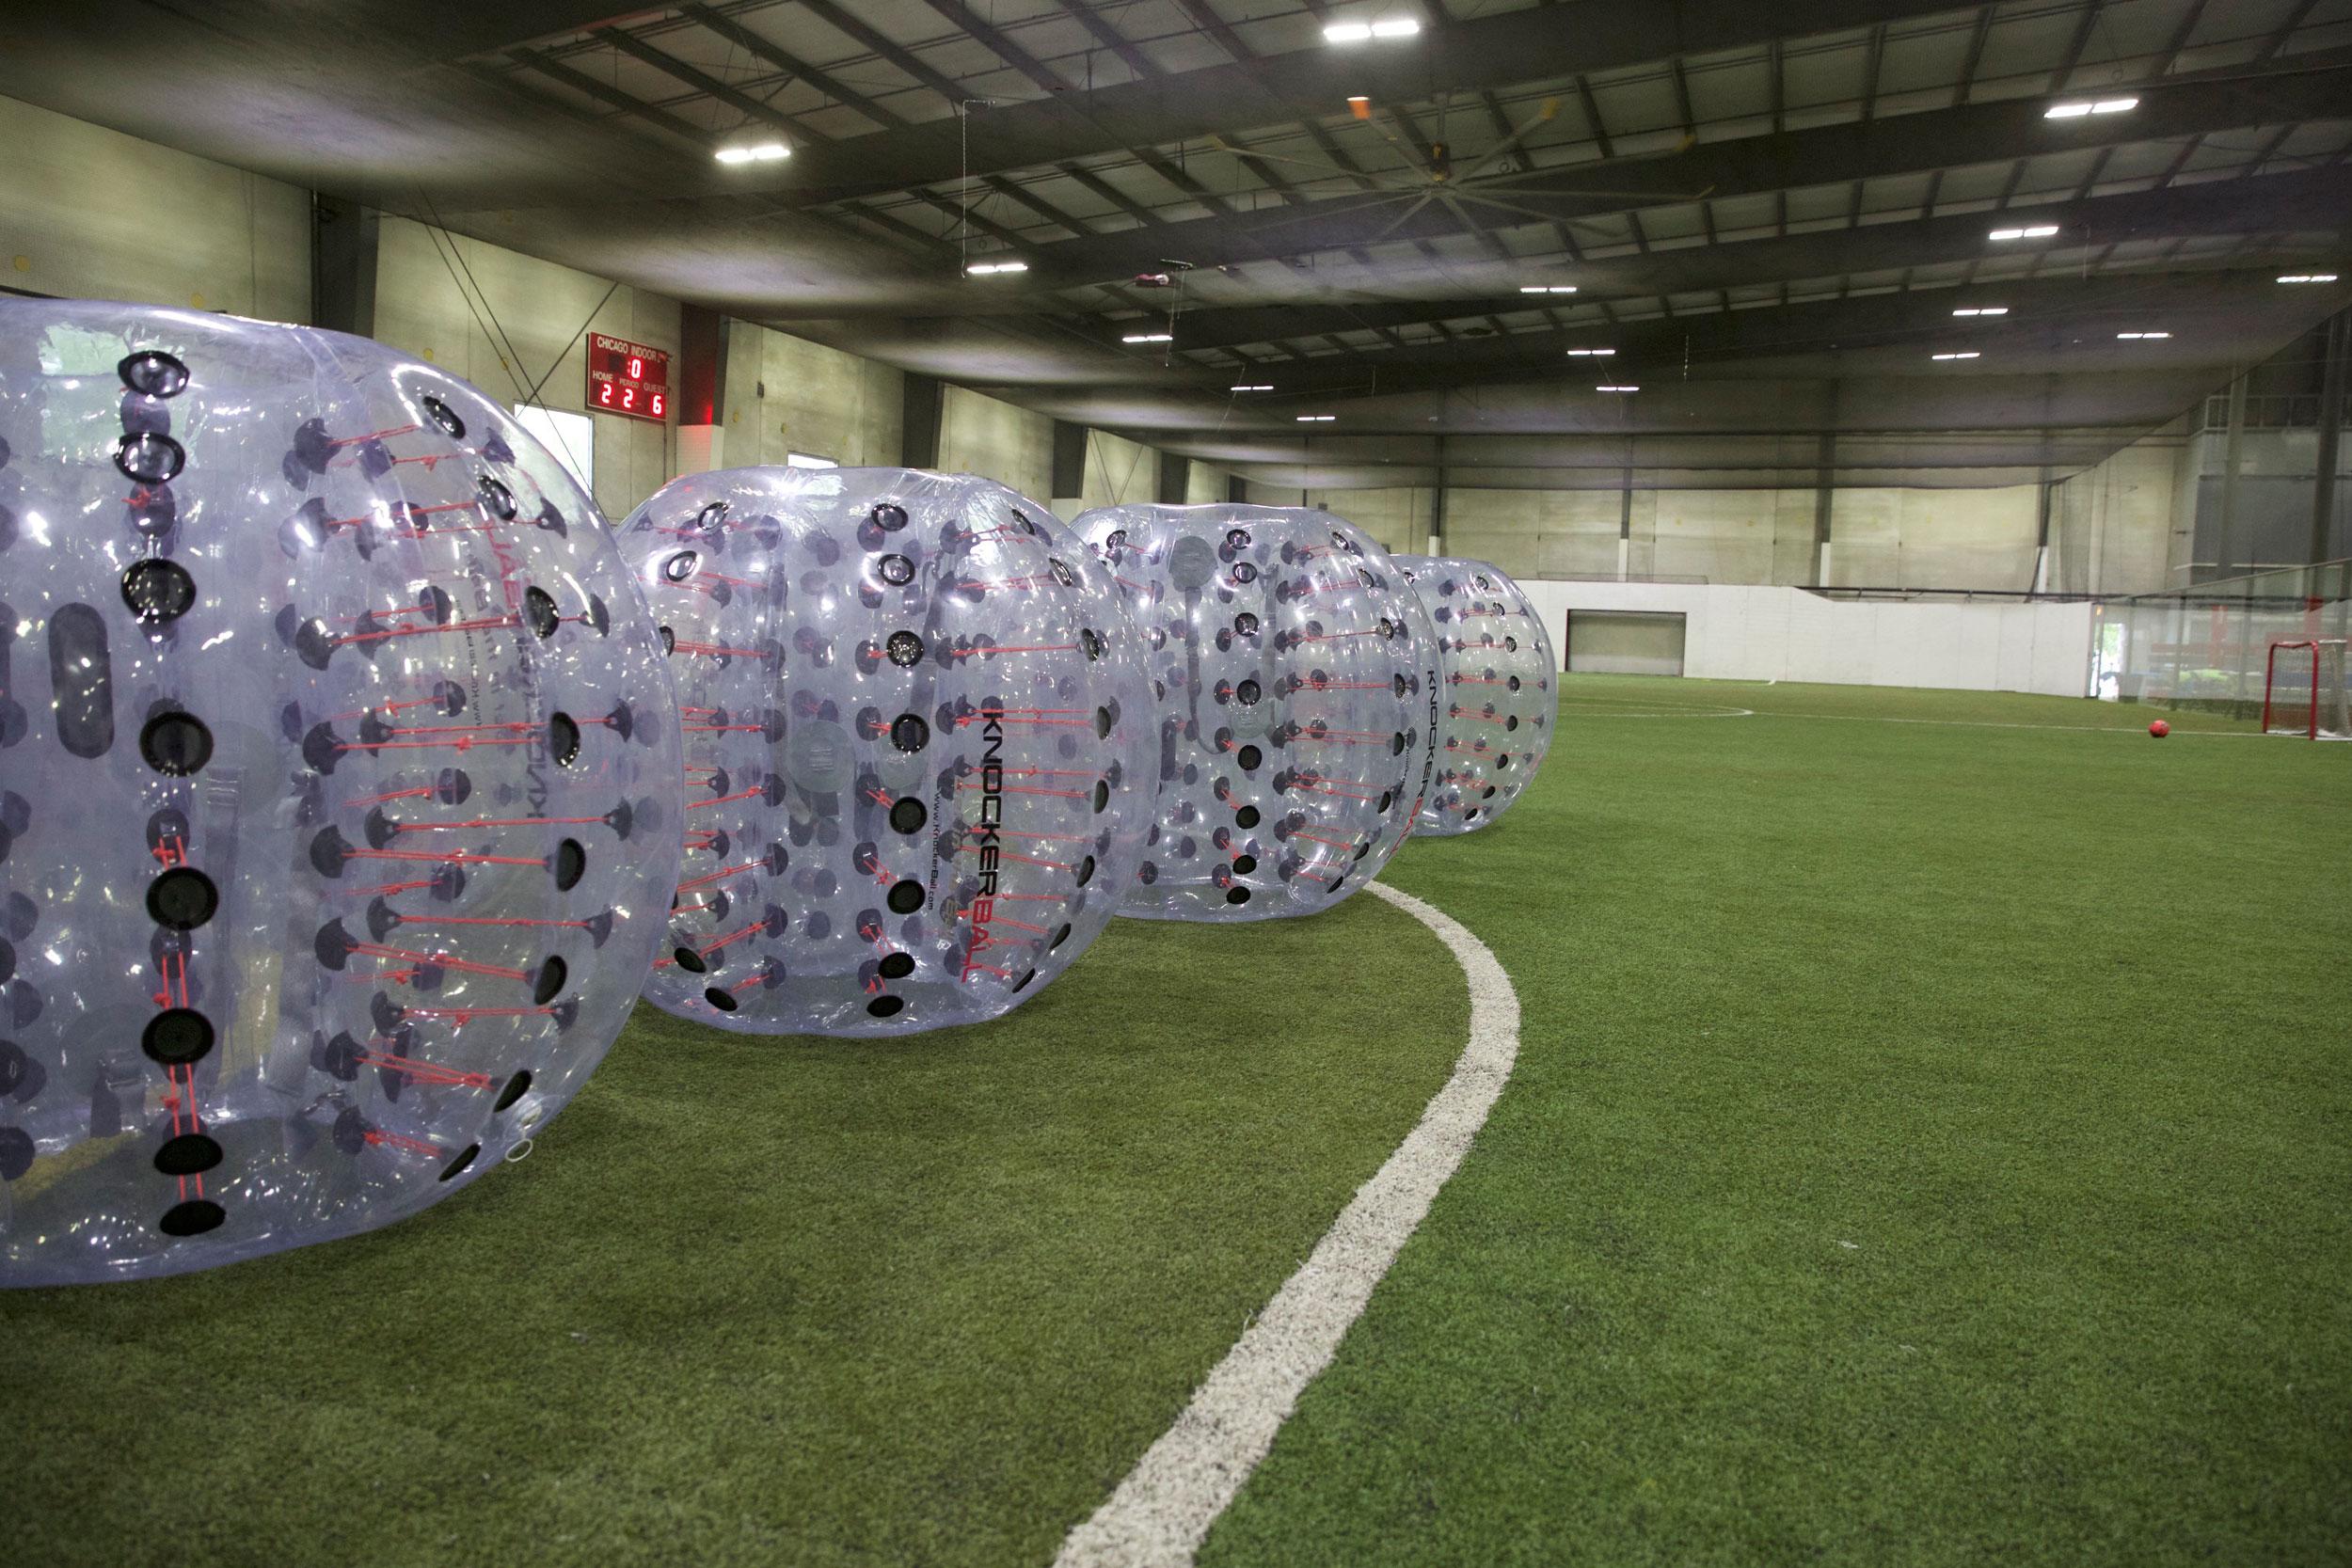 Bubble Soccer